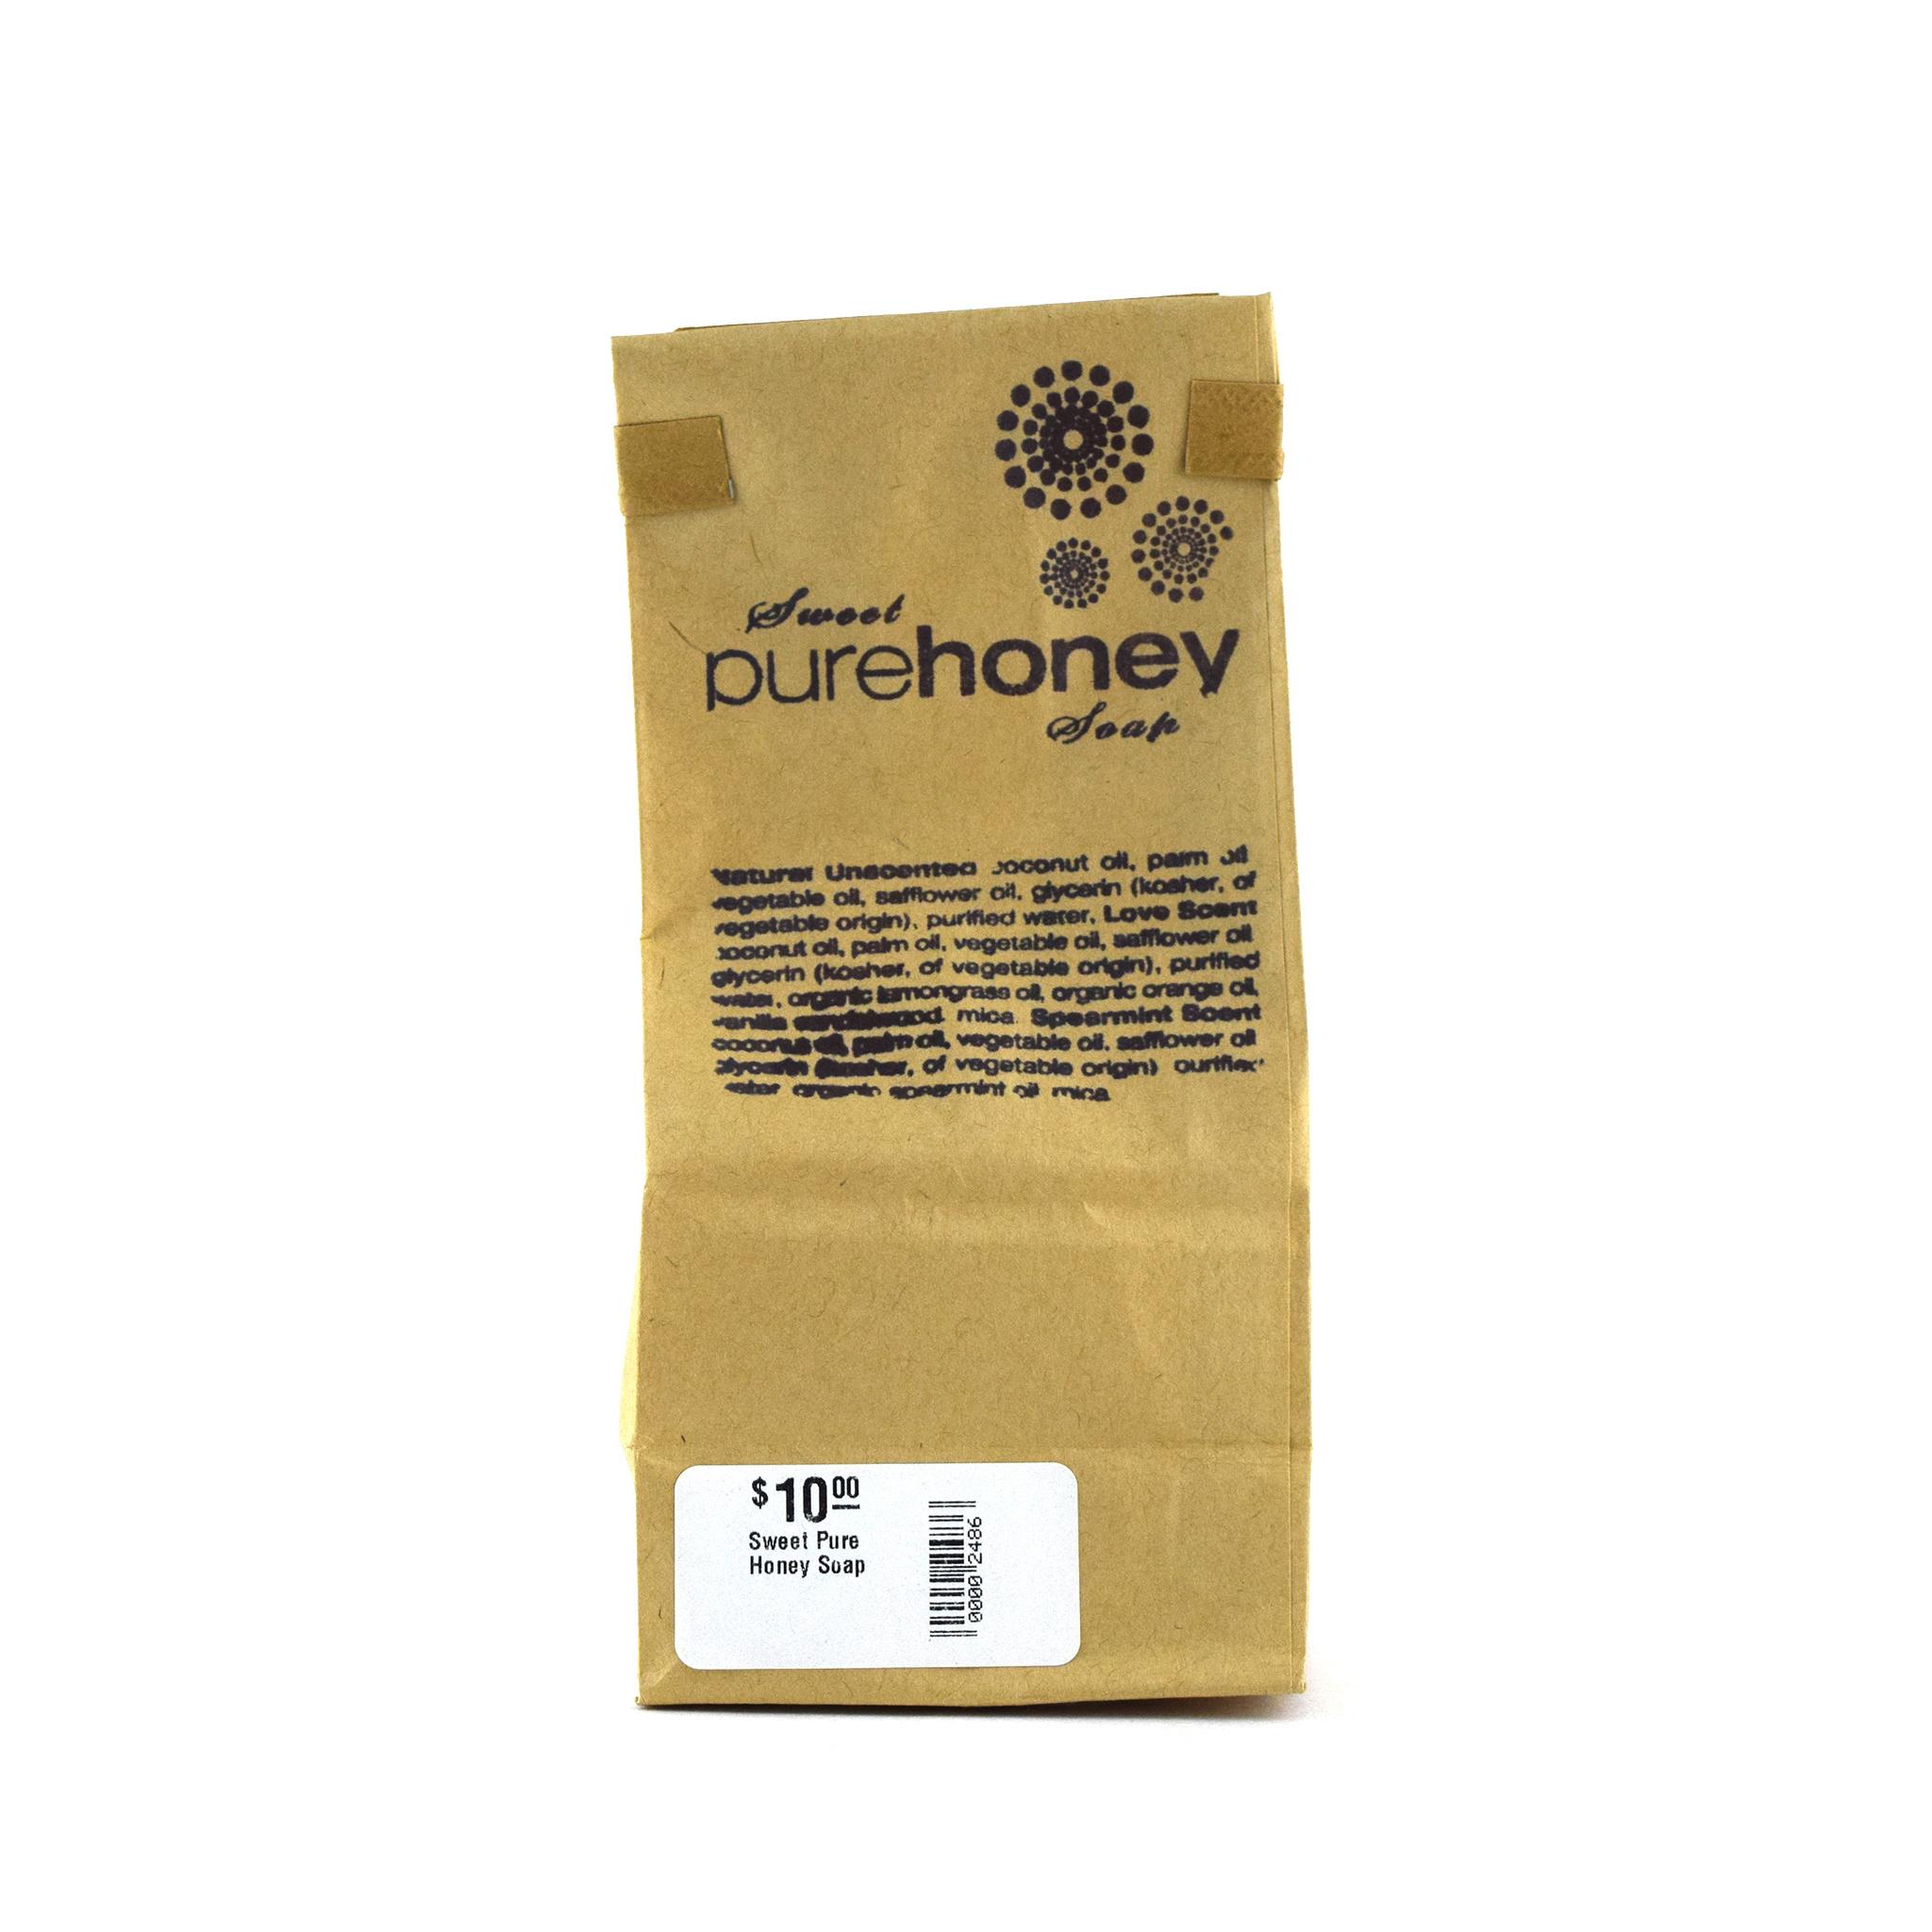 Sweet Pure Honey Soap